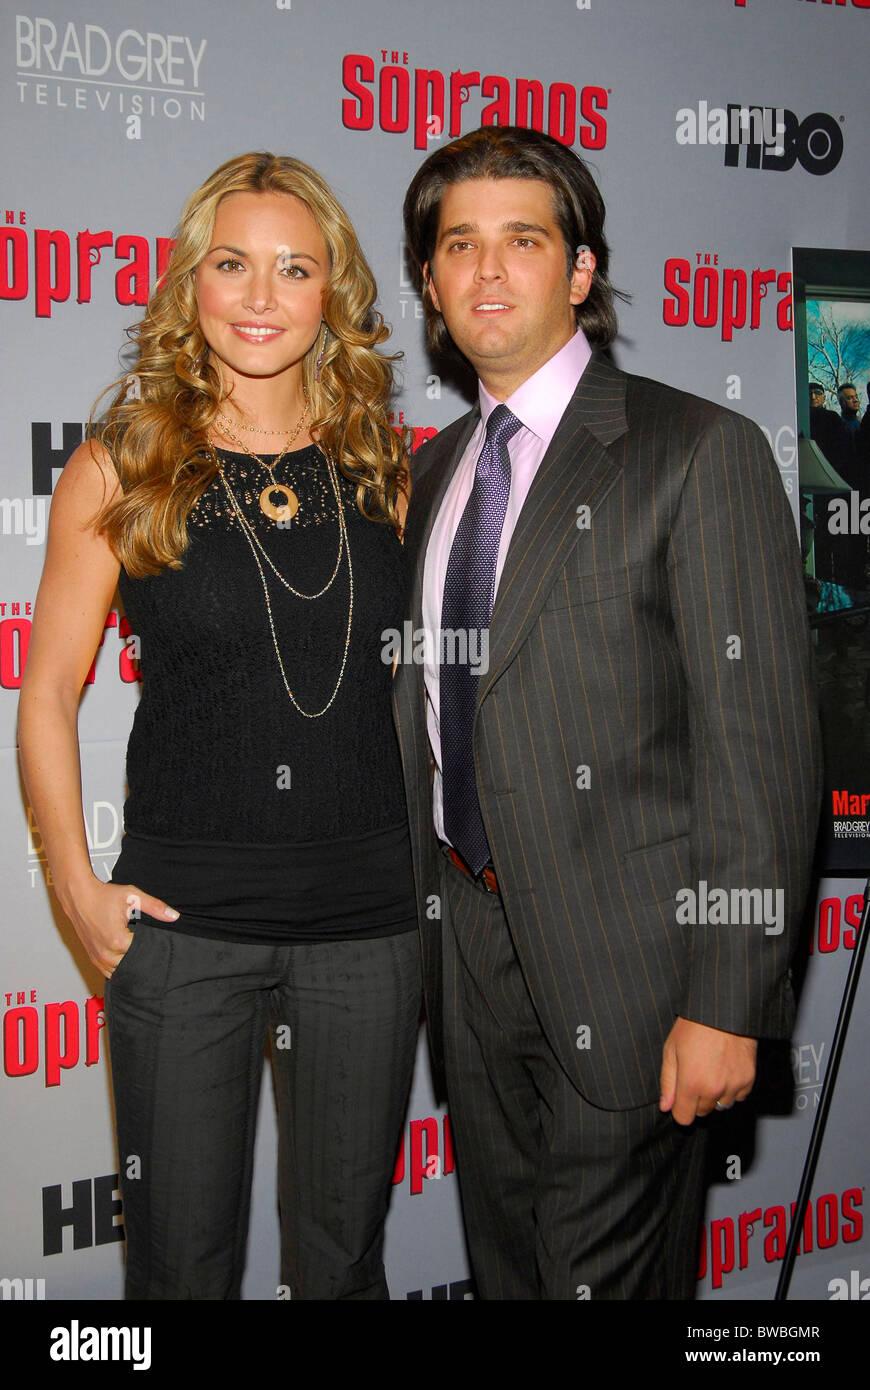 Hbo The Sopranos Final Season Premiere Stock Image